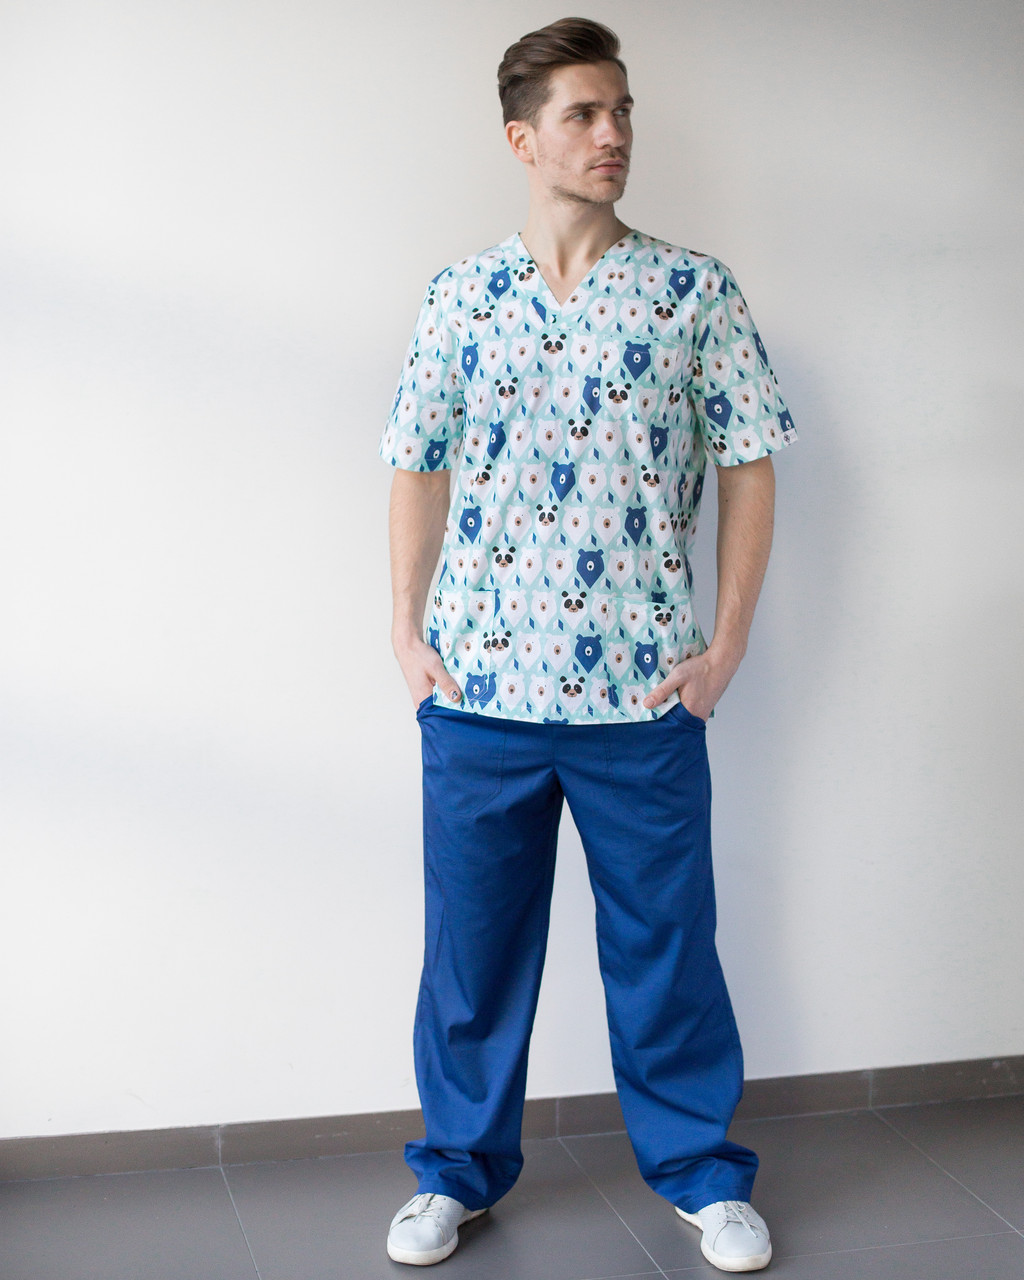 Медицинский мужской костюм Гранит принт мишки мята-синий